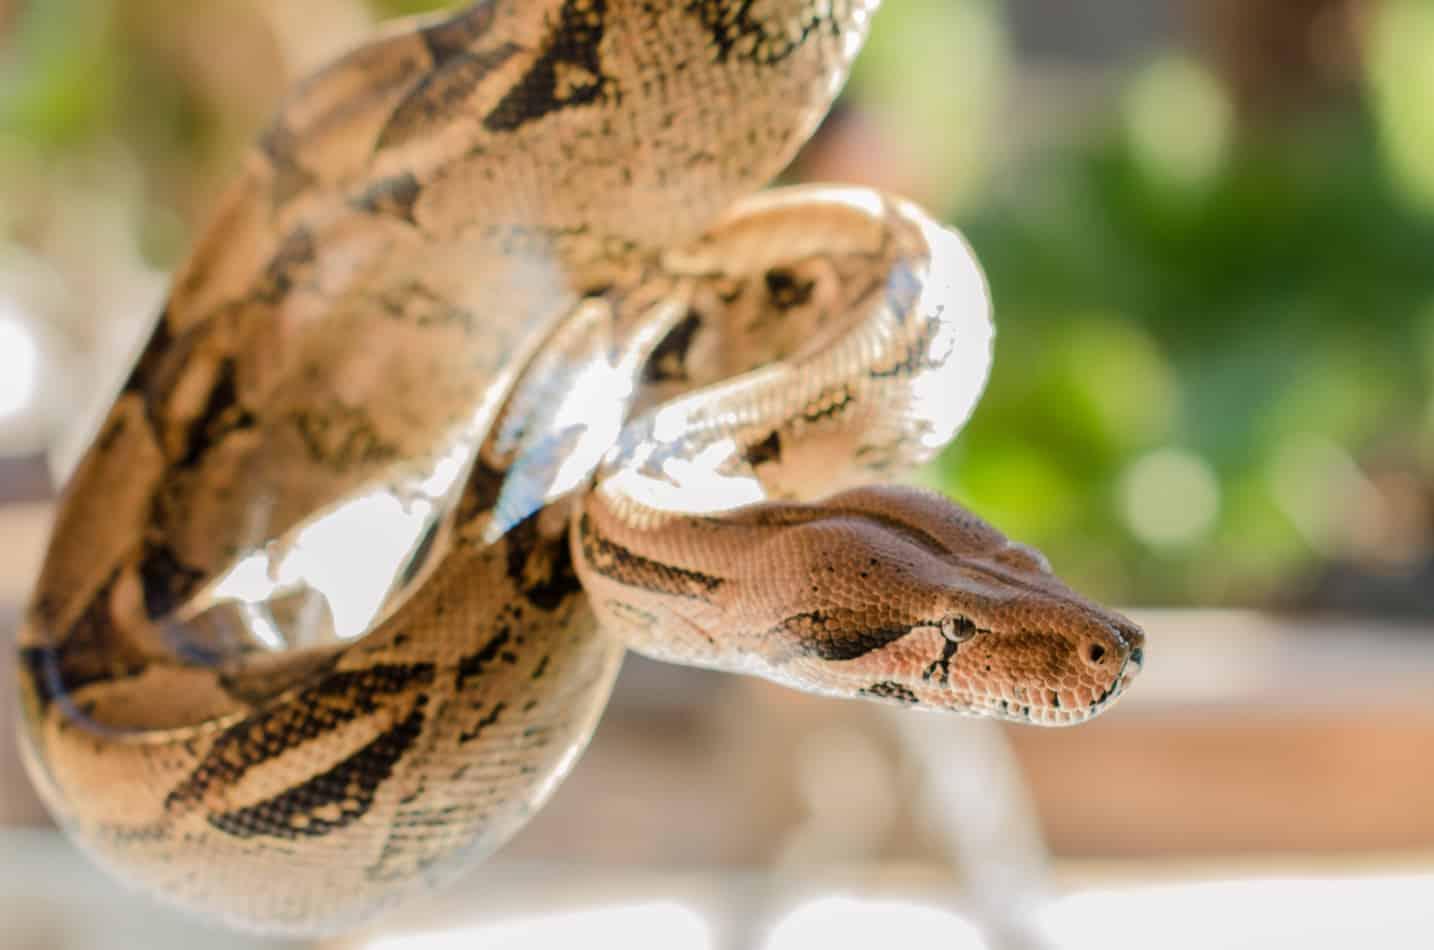 Are Boa Constrictors Poisonous?